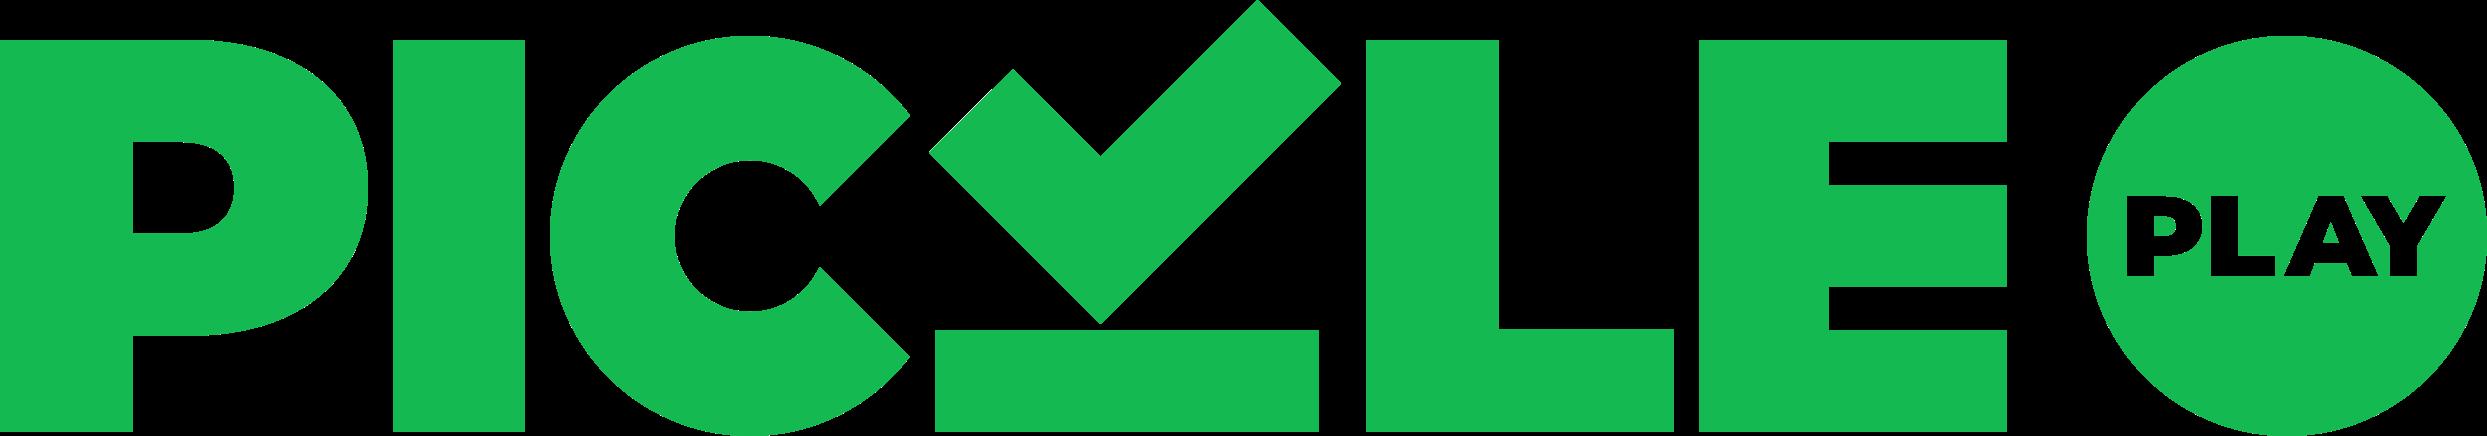 pickleplay logo